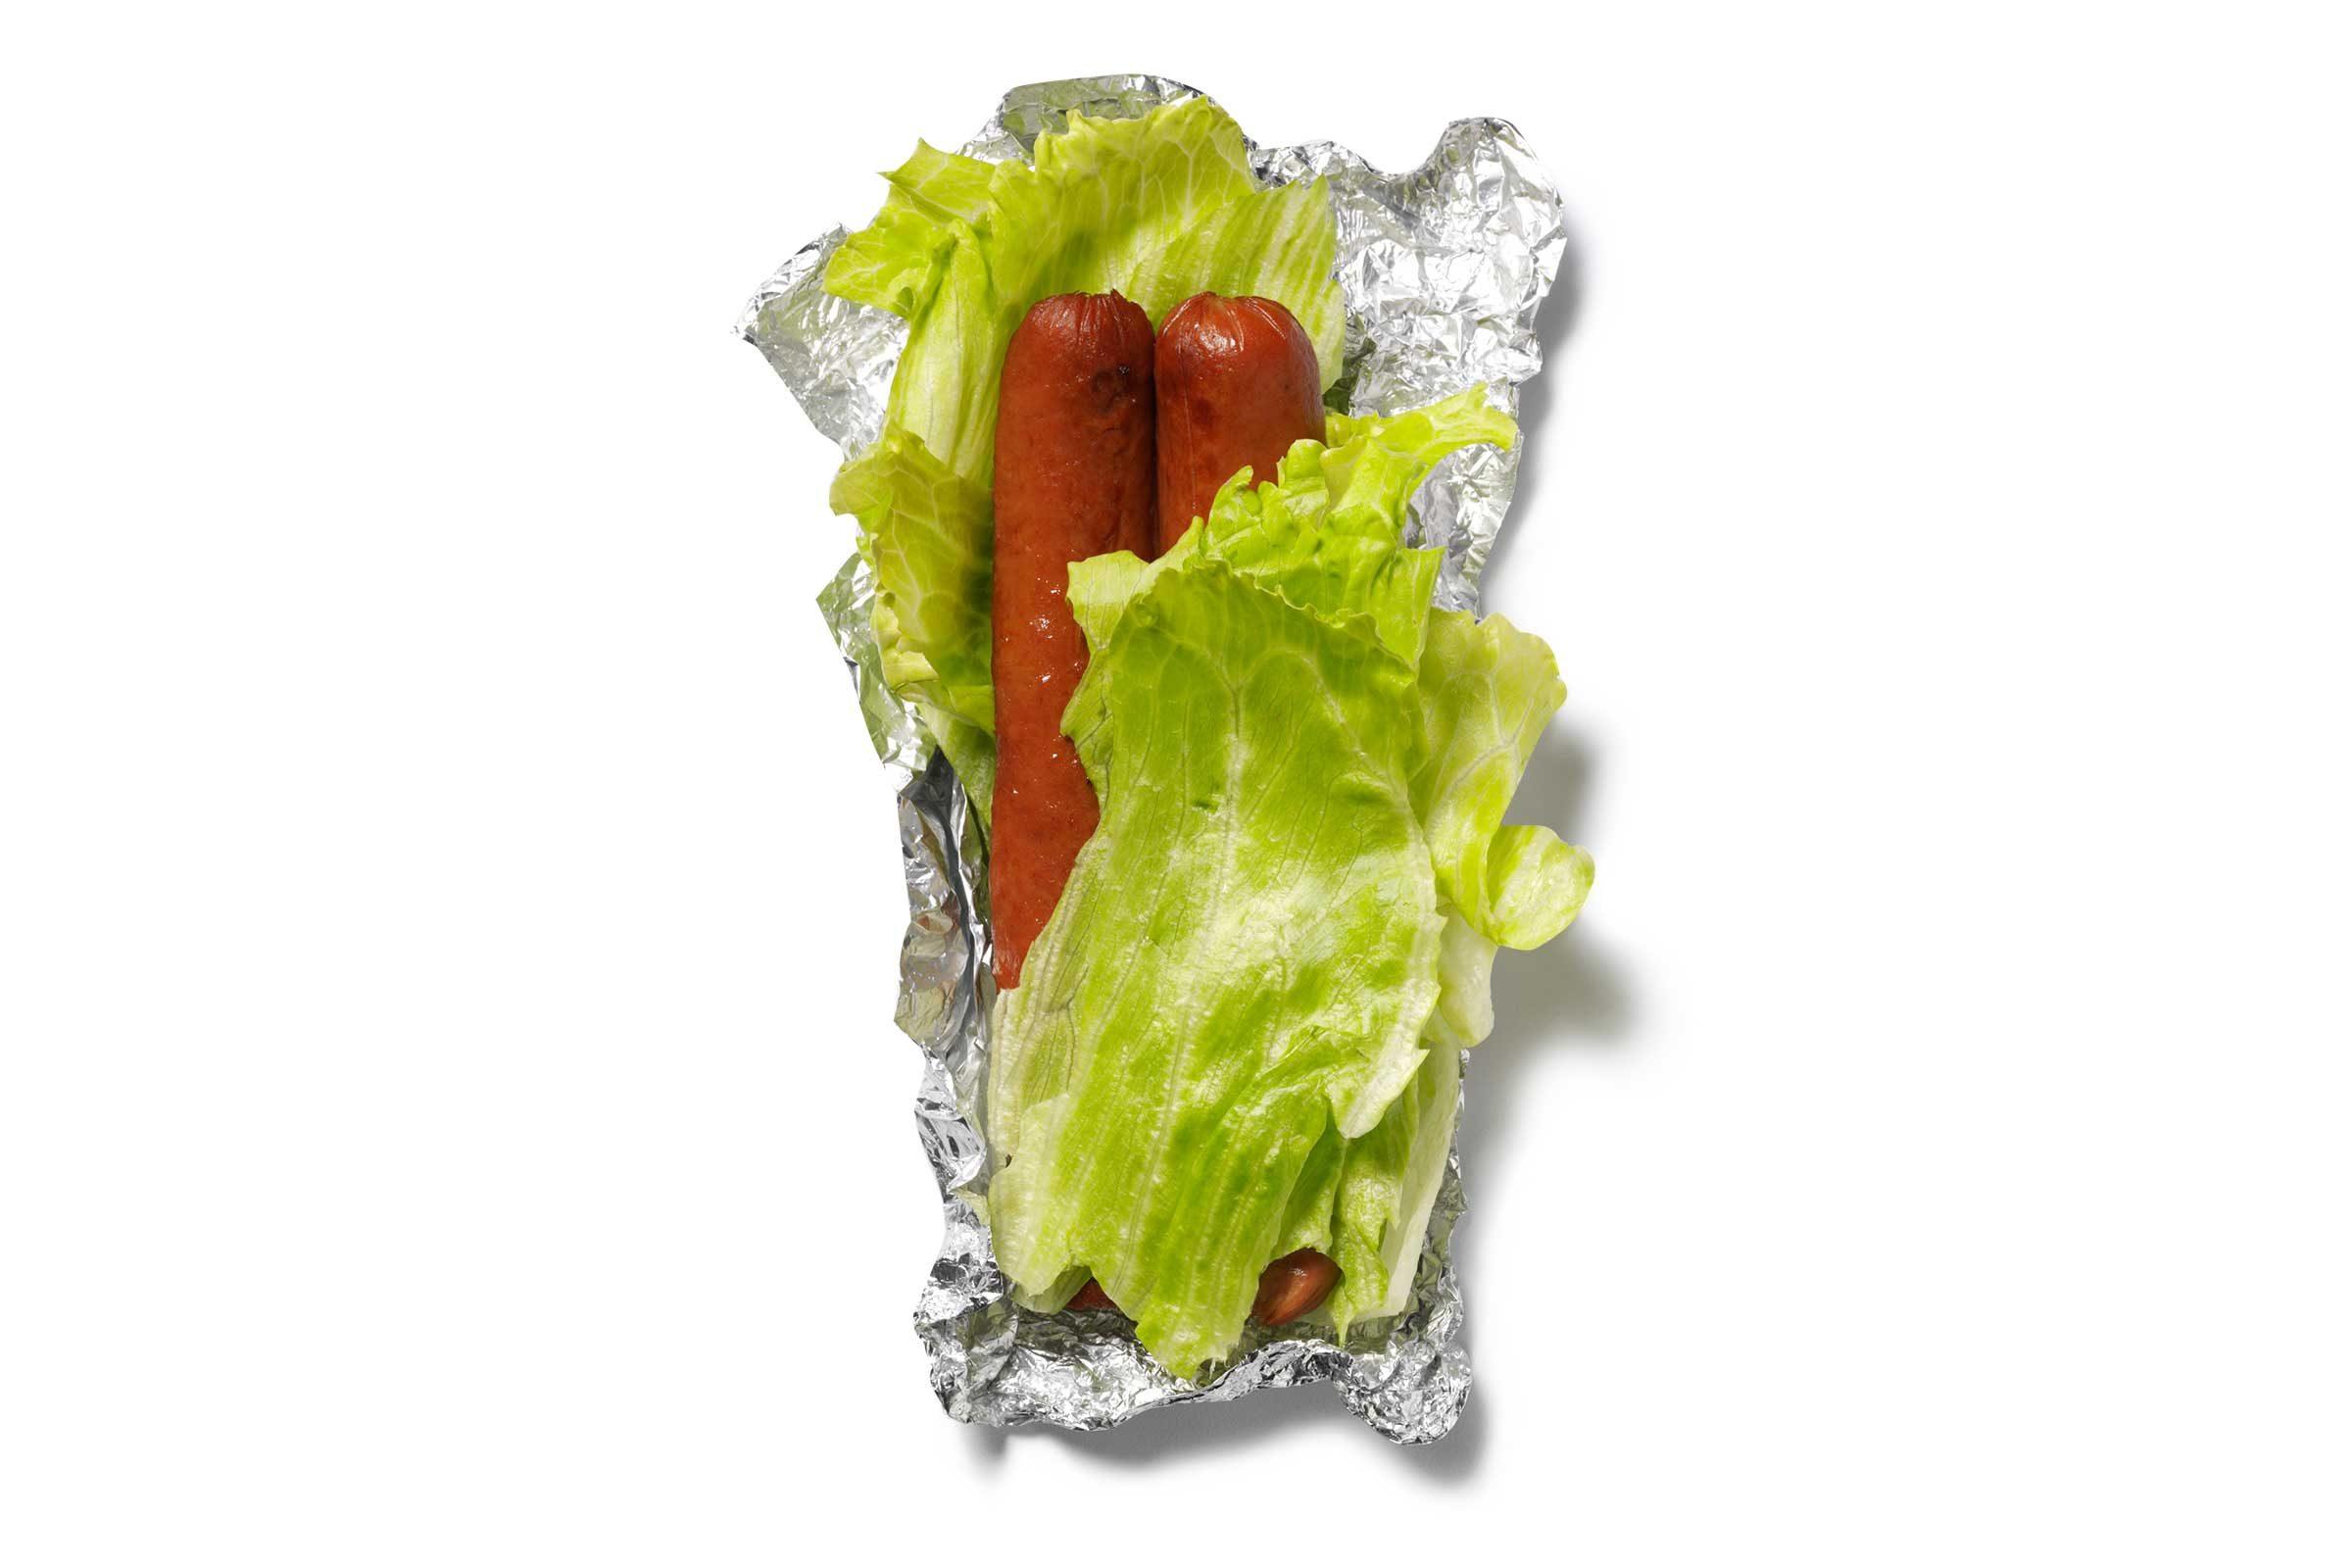 Hot Dogs Tgi